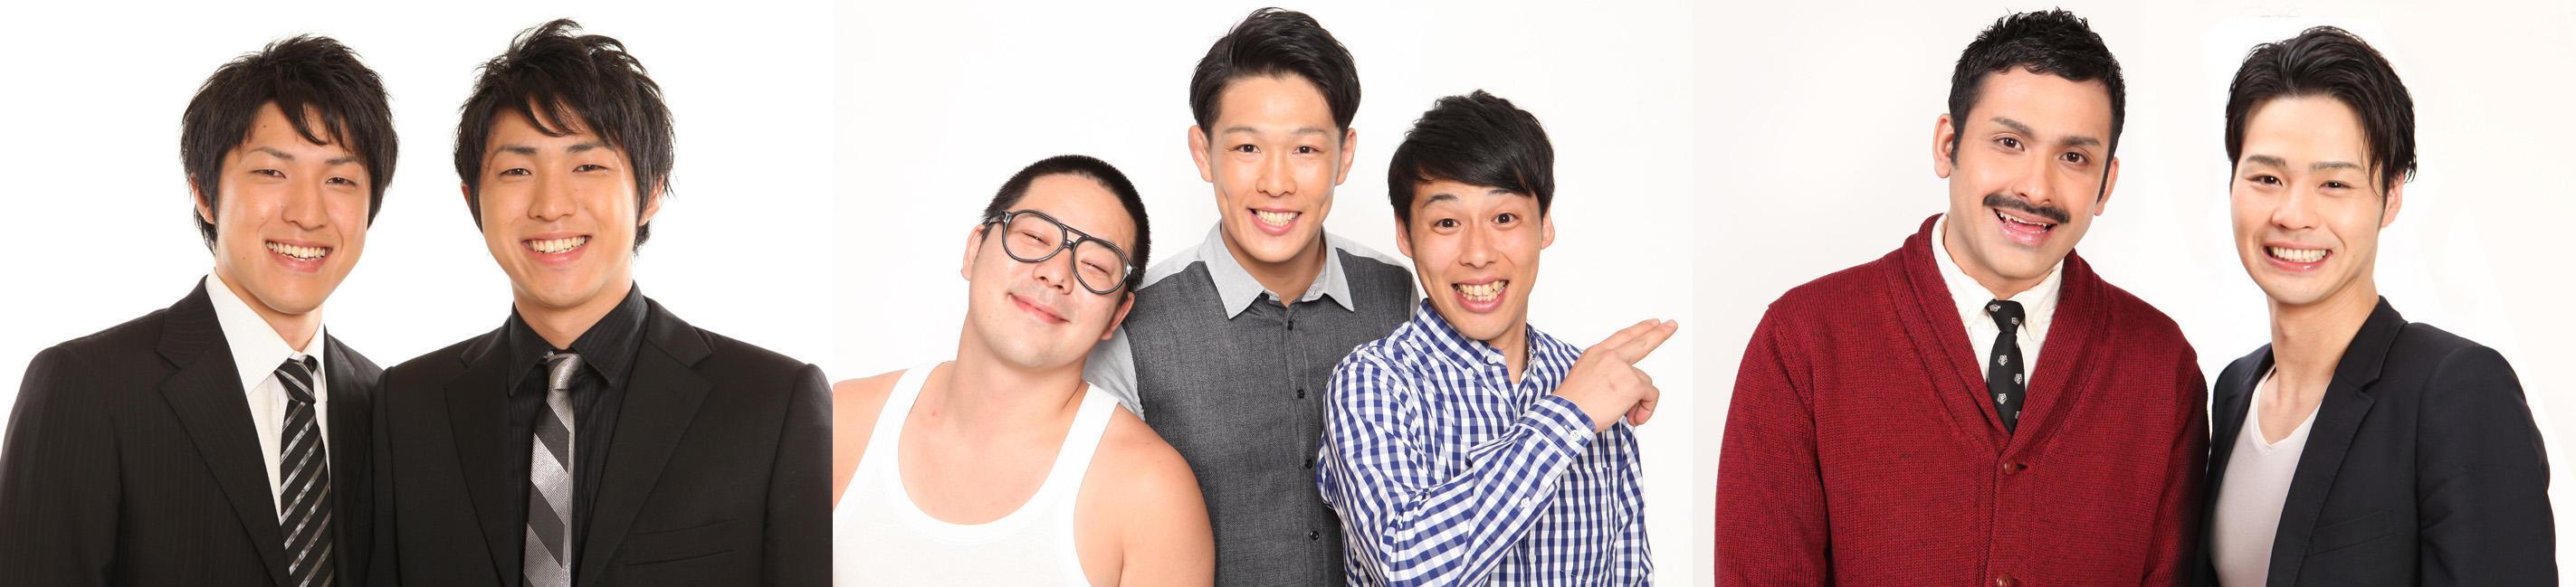 http://news.yoshimoto.co.jp/20170531163223-94083b87132403ef6ce1b1c049a37069cd09d3f1.jpg